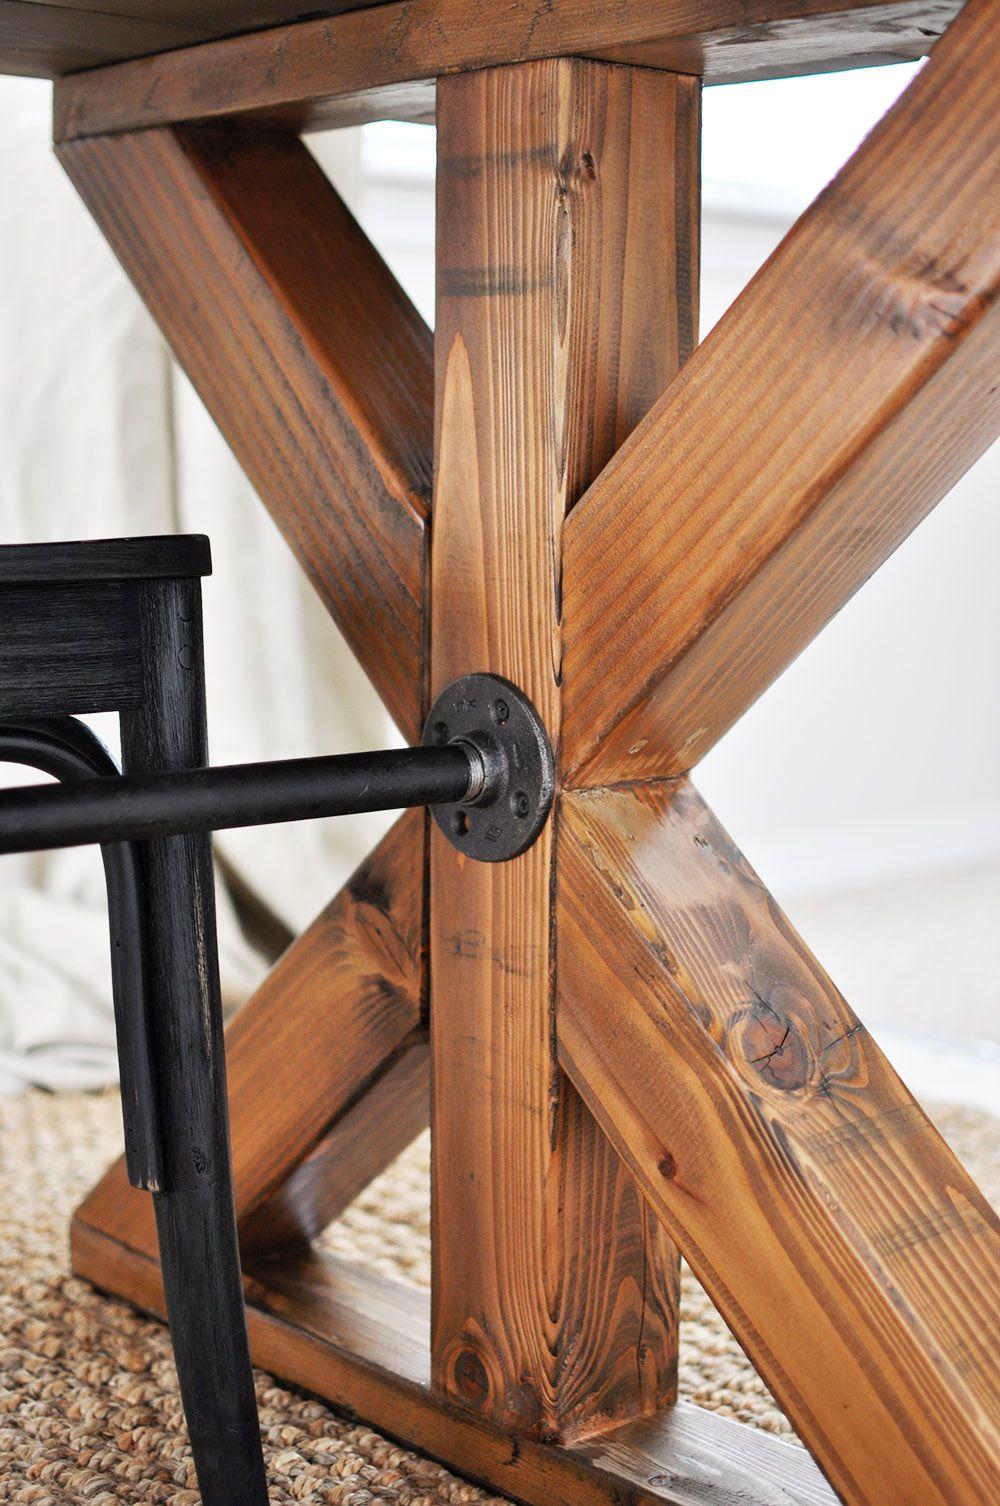 X Brace Farmhouse Table Farmhouse table, Farmhouse style